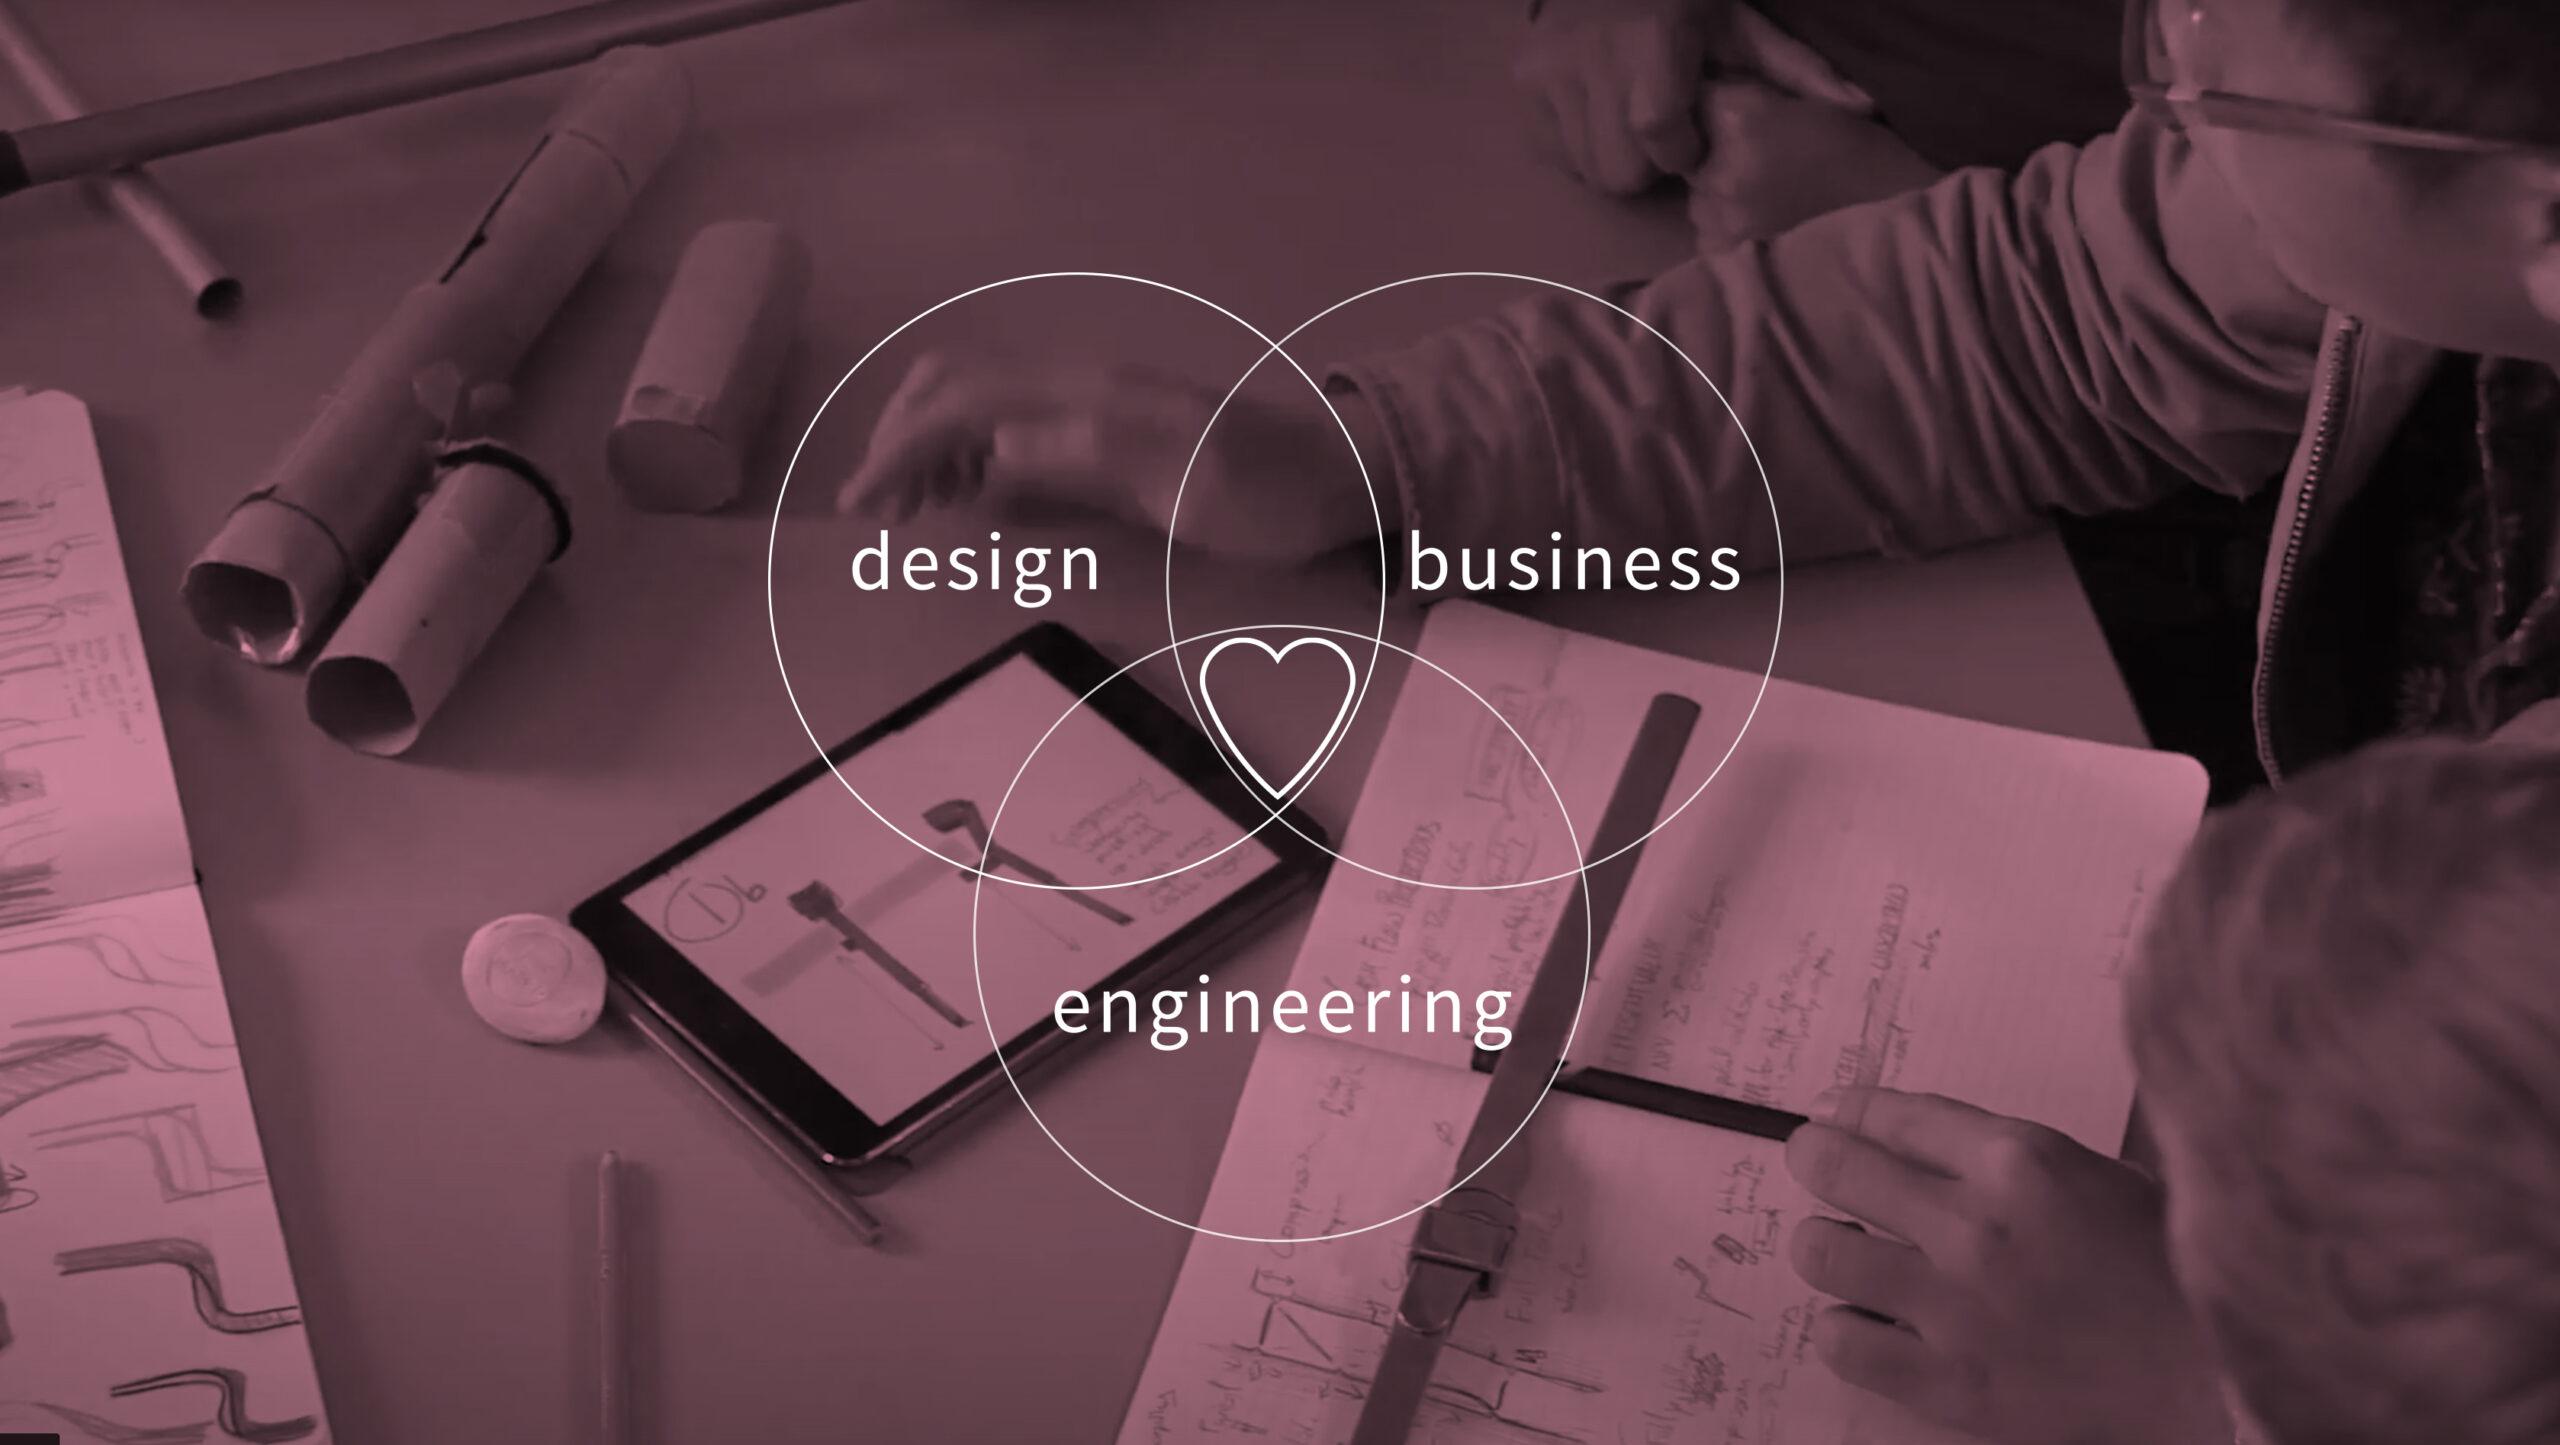 IDM venn diagram. Design, business, engineering.